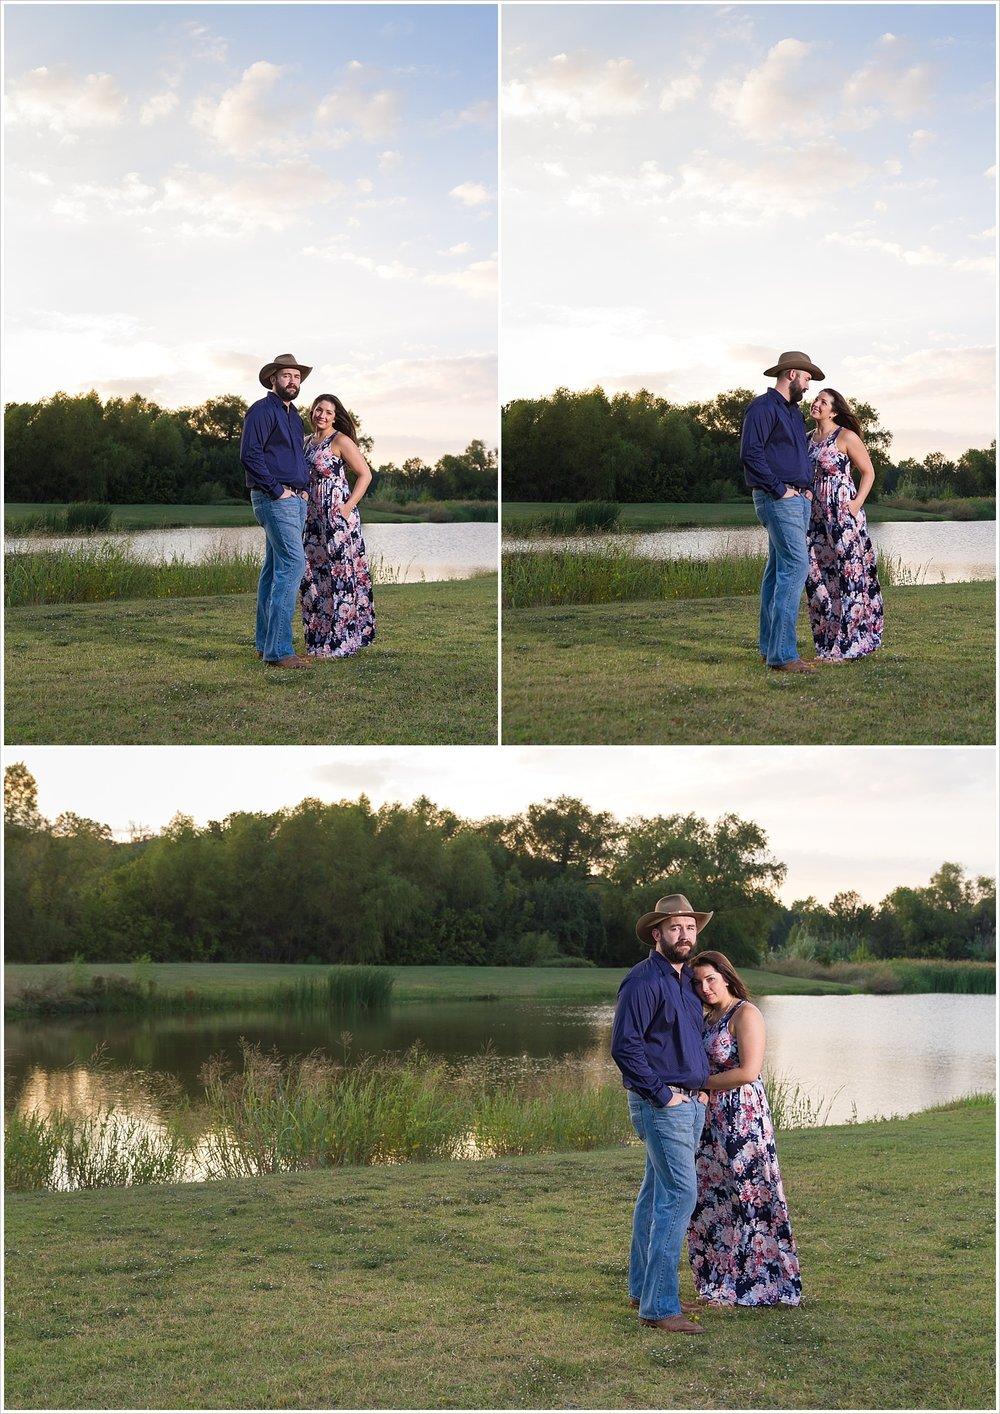 Cameron-Park-Waco-Engagement-Portraits_0018.jpg